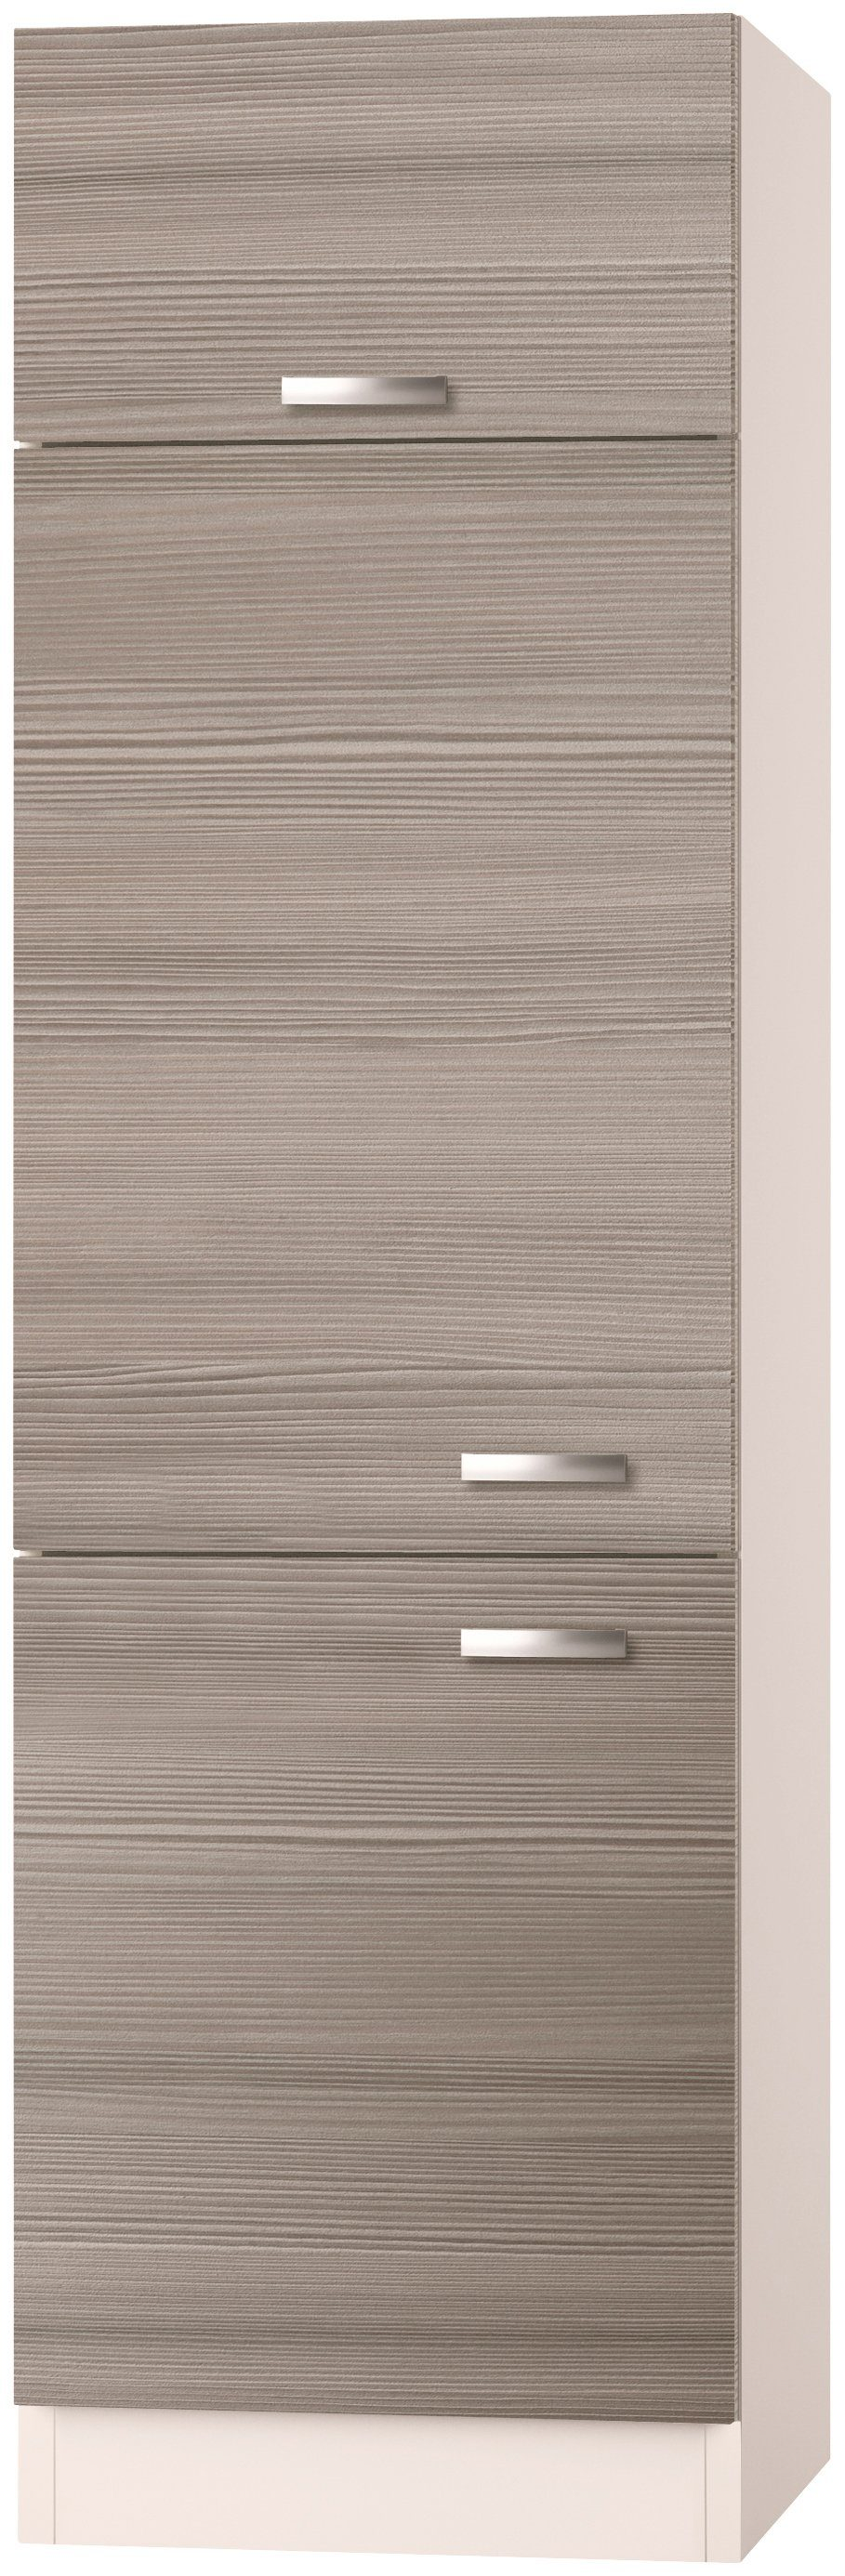 Optifit Kühlumbauschrank »Vigo«, Höhe 206,8 cm